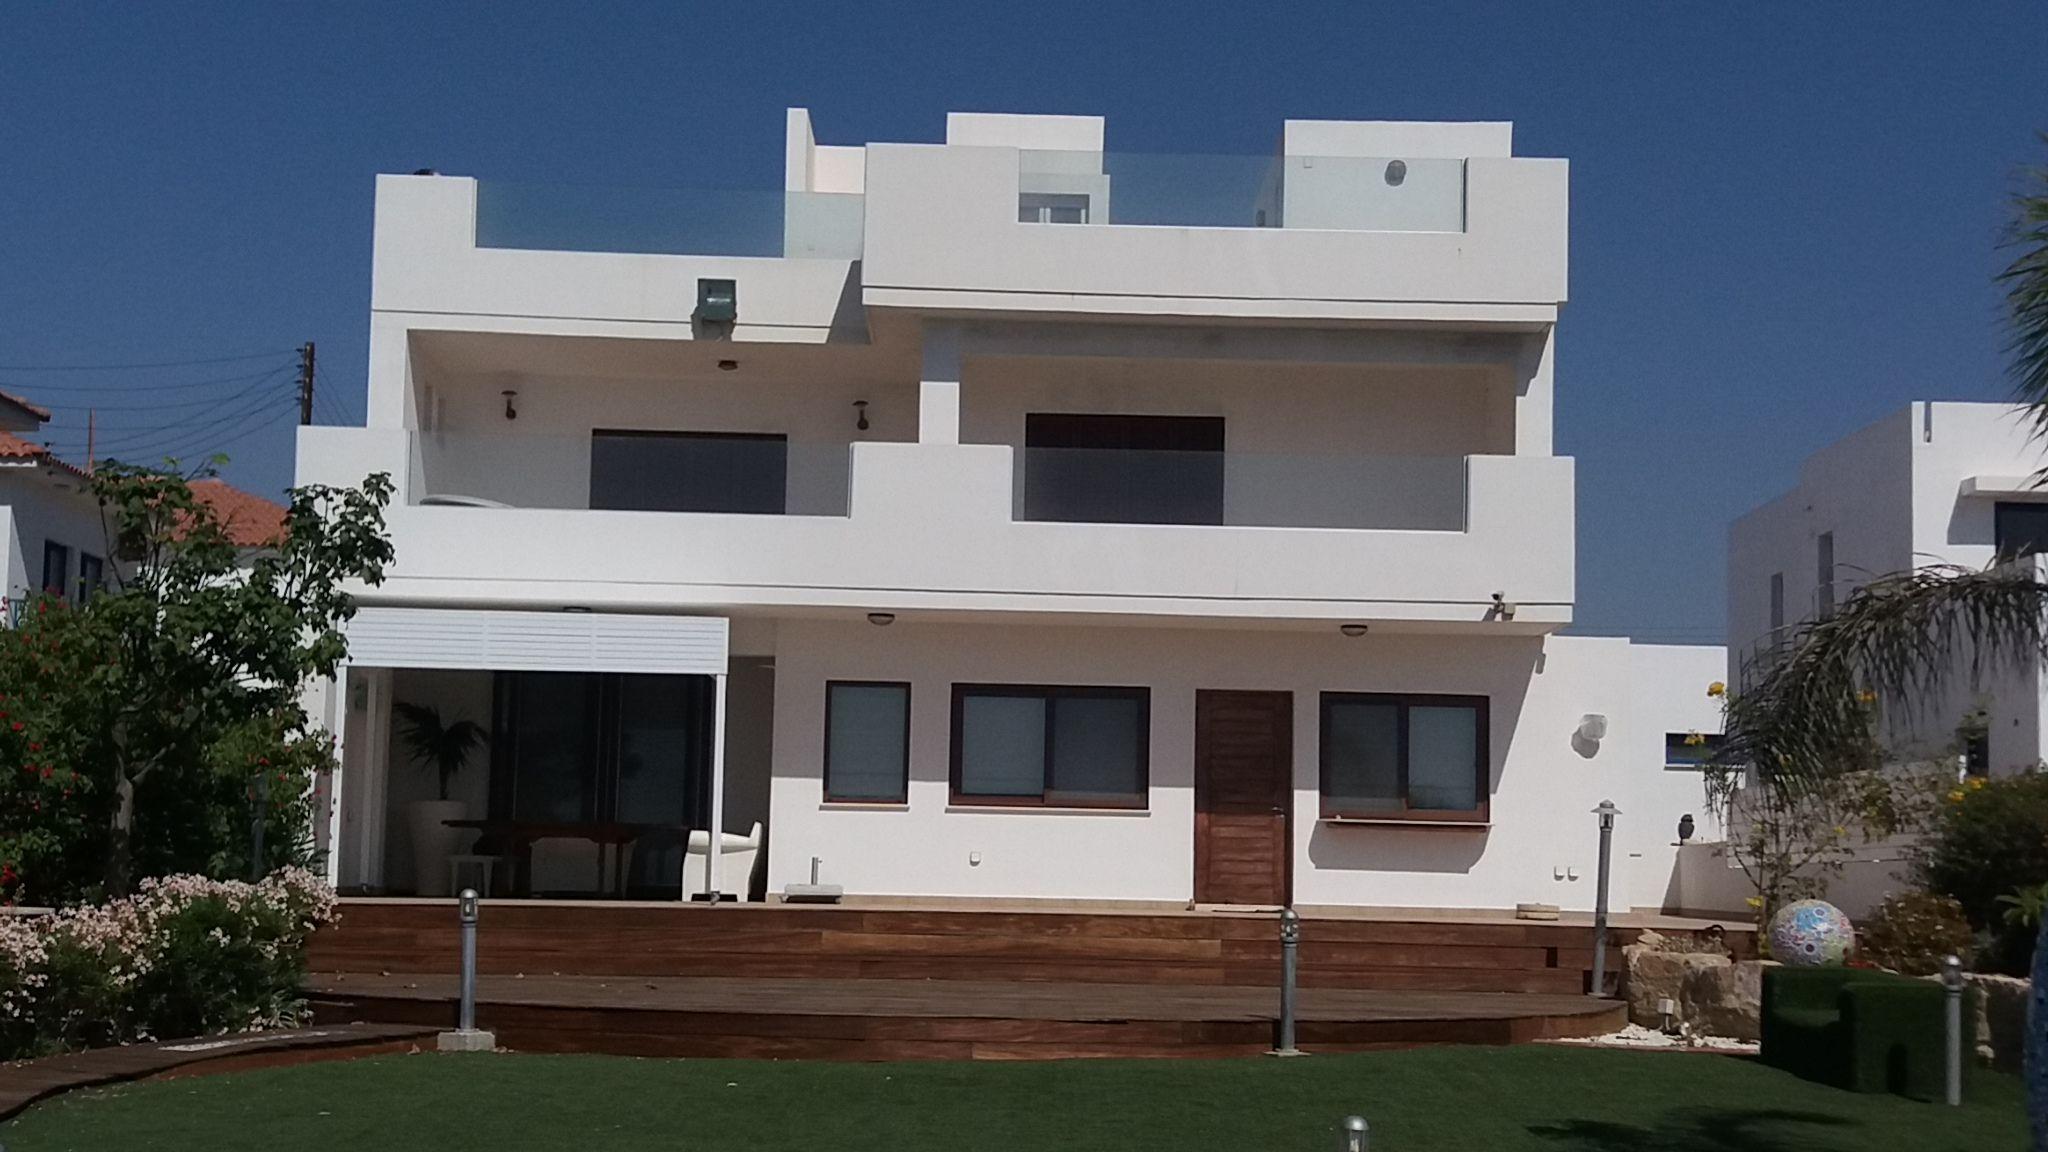 4 bedroom Beachfront beautiful Villa in Zygi, Larnaca  4 Bed.....